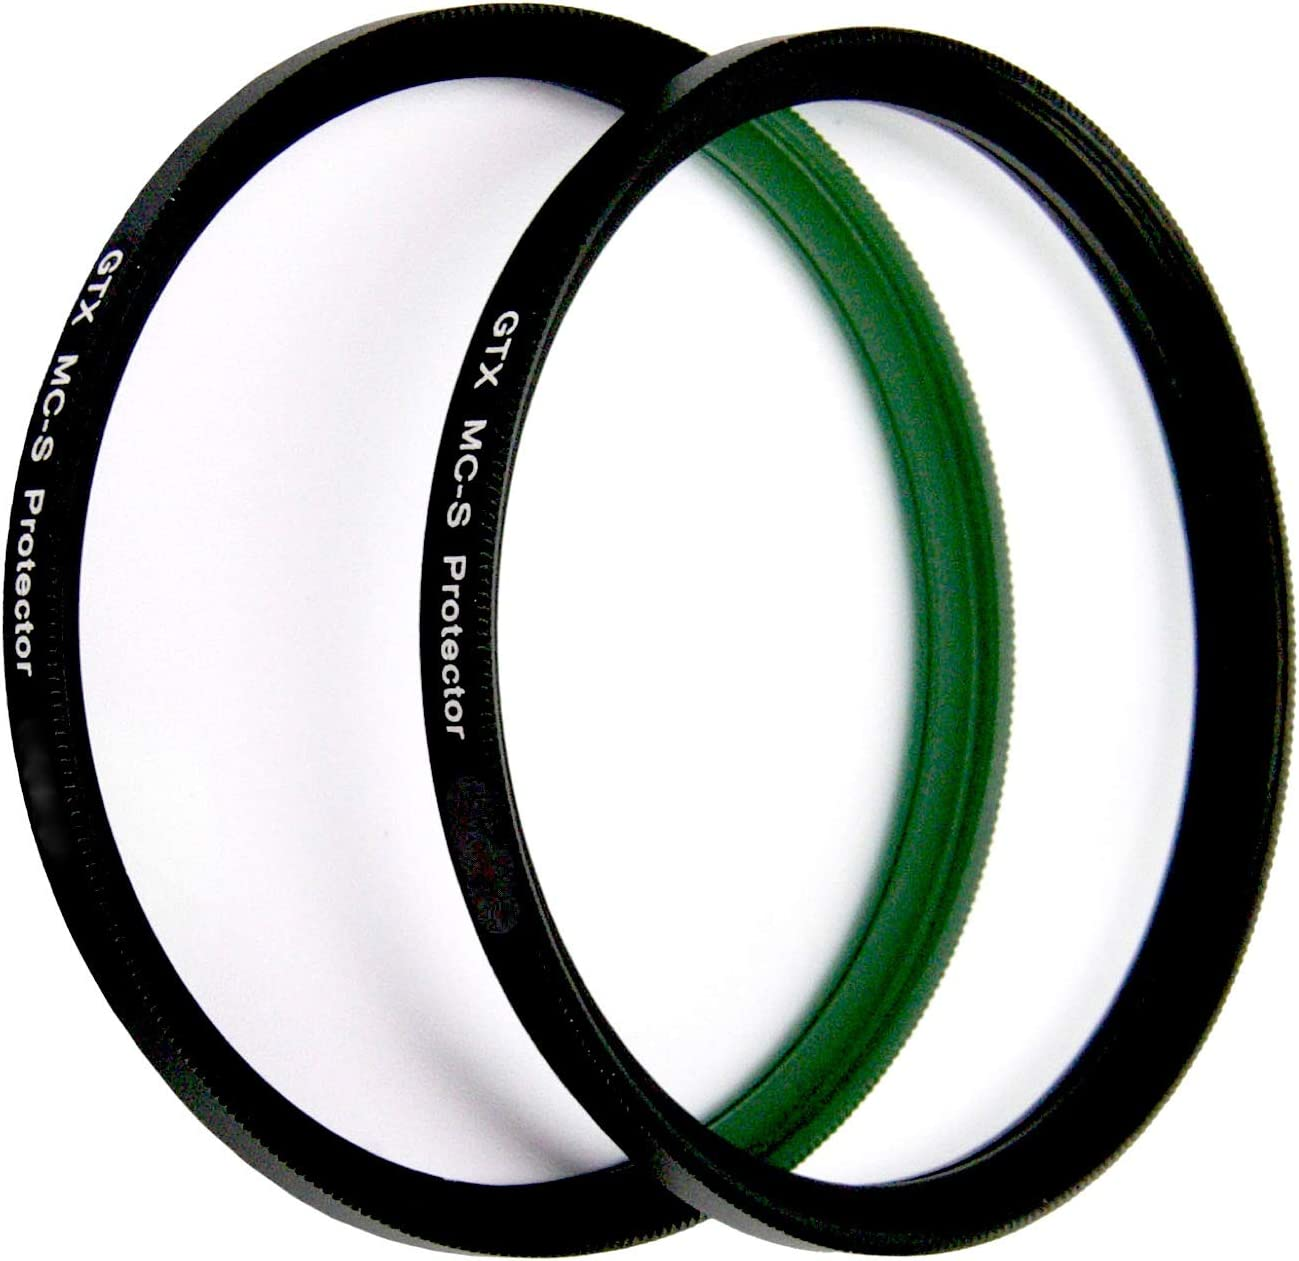 82mm S-Series Schott Glass Protector Filter Digital Camera DSLR Lens